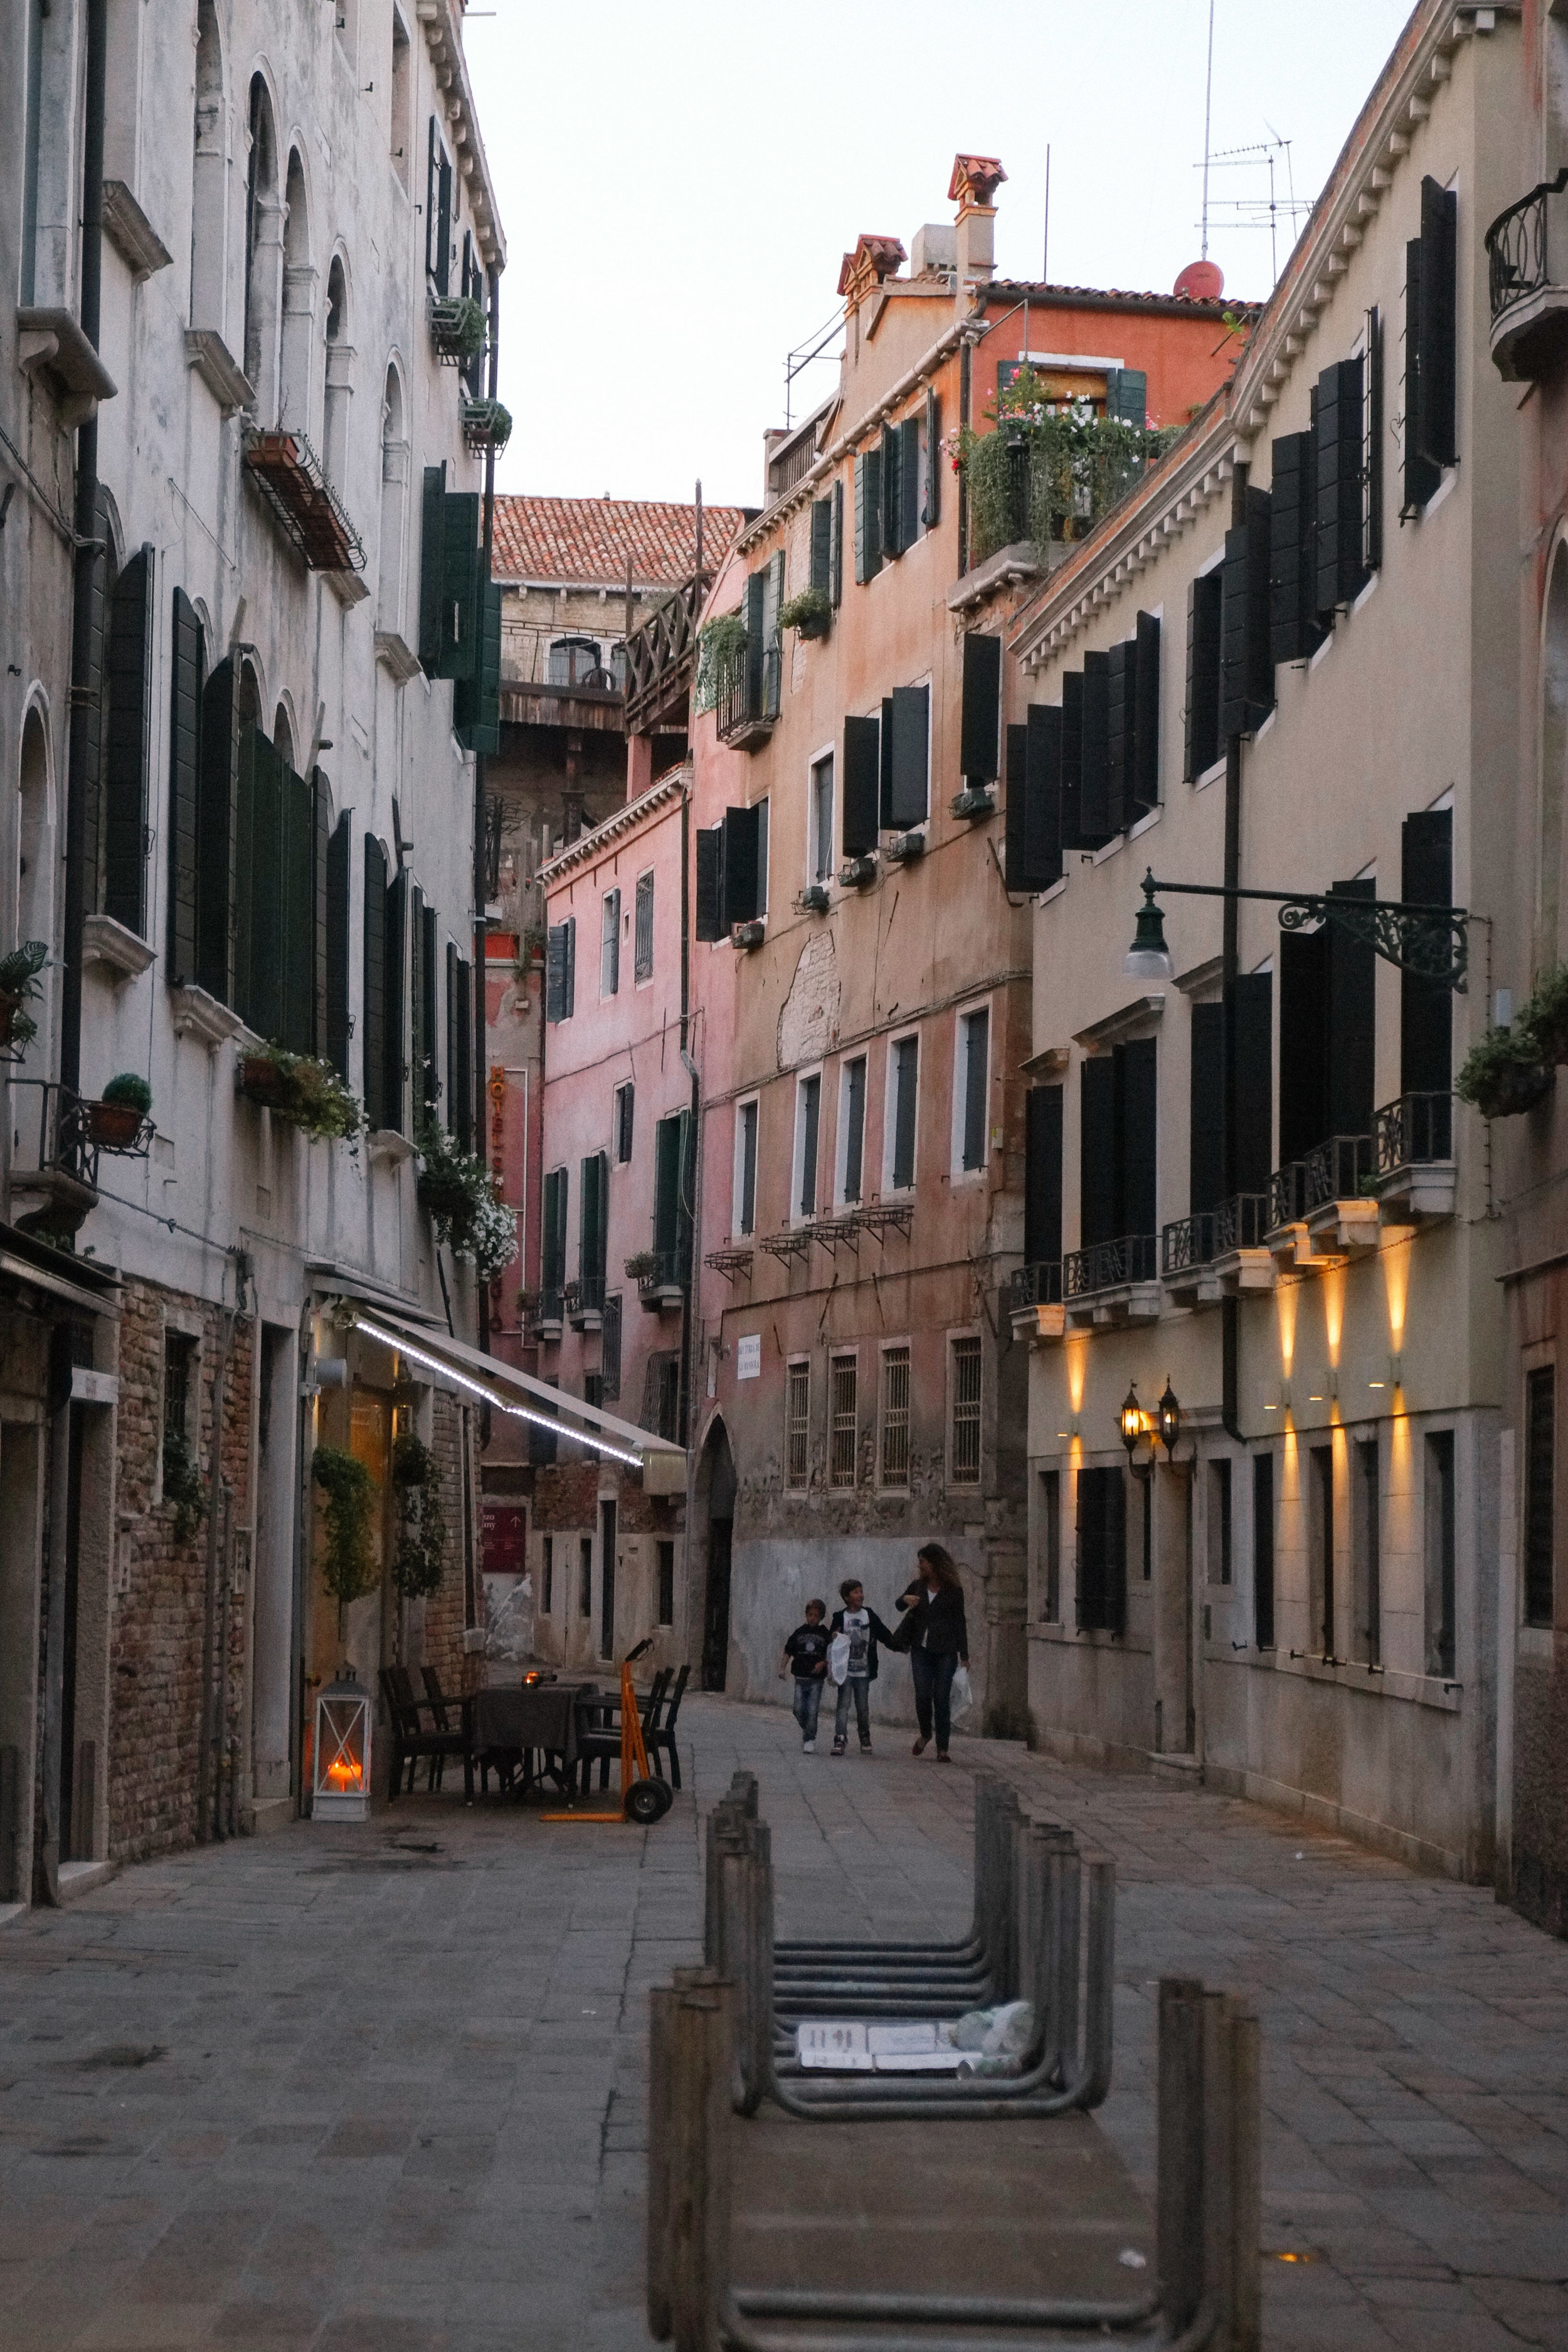 Lesly Lotha_Venice_Italy 04.jpg